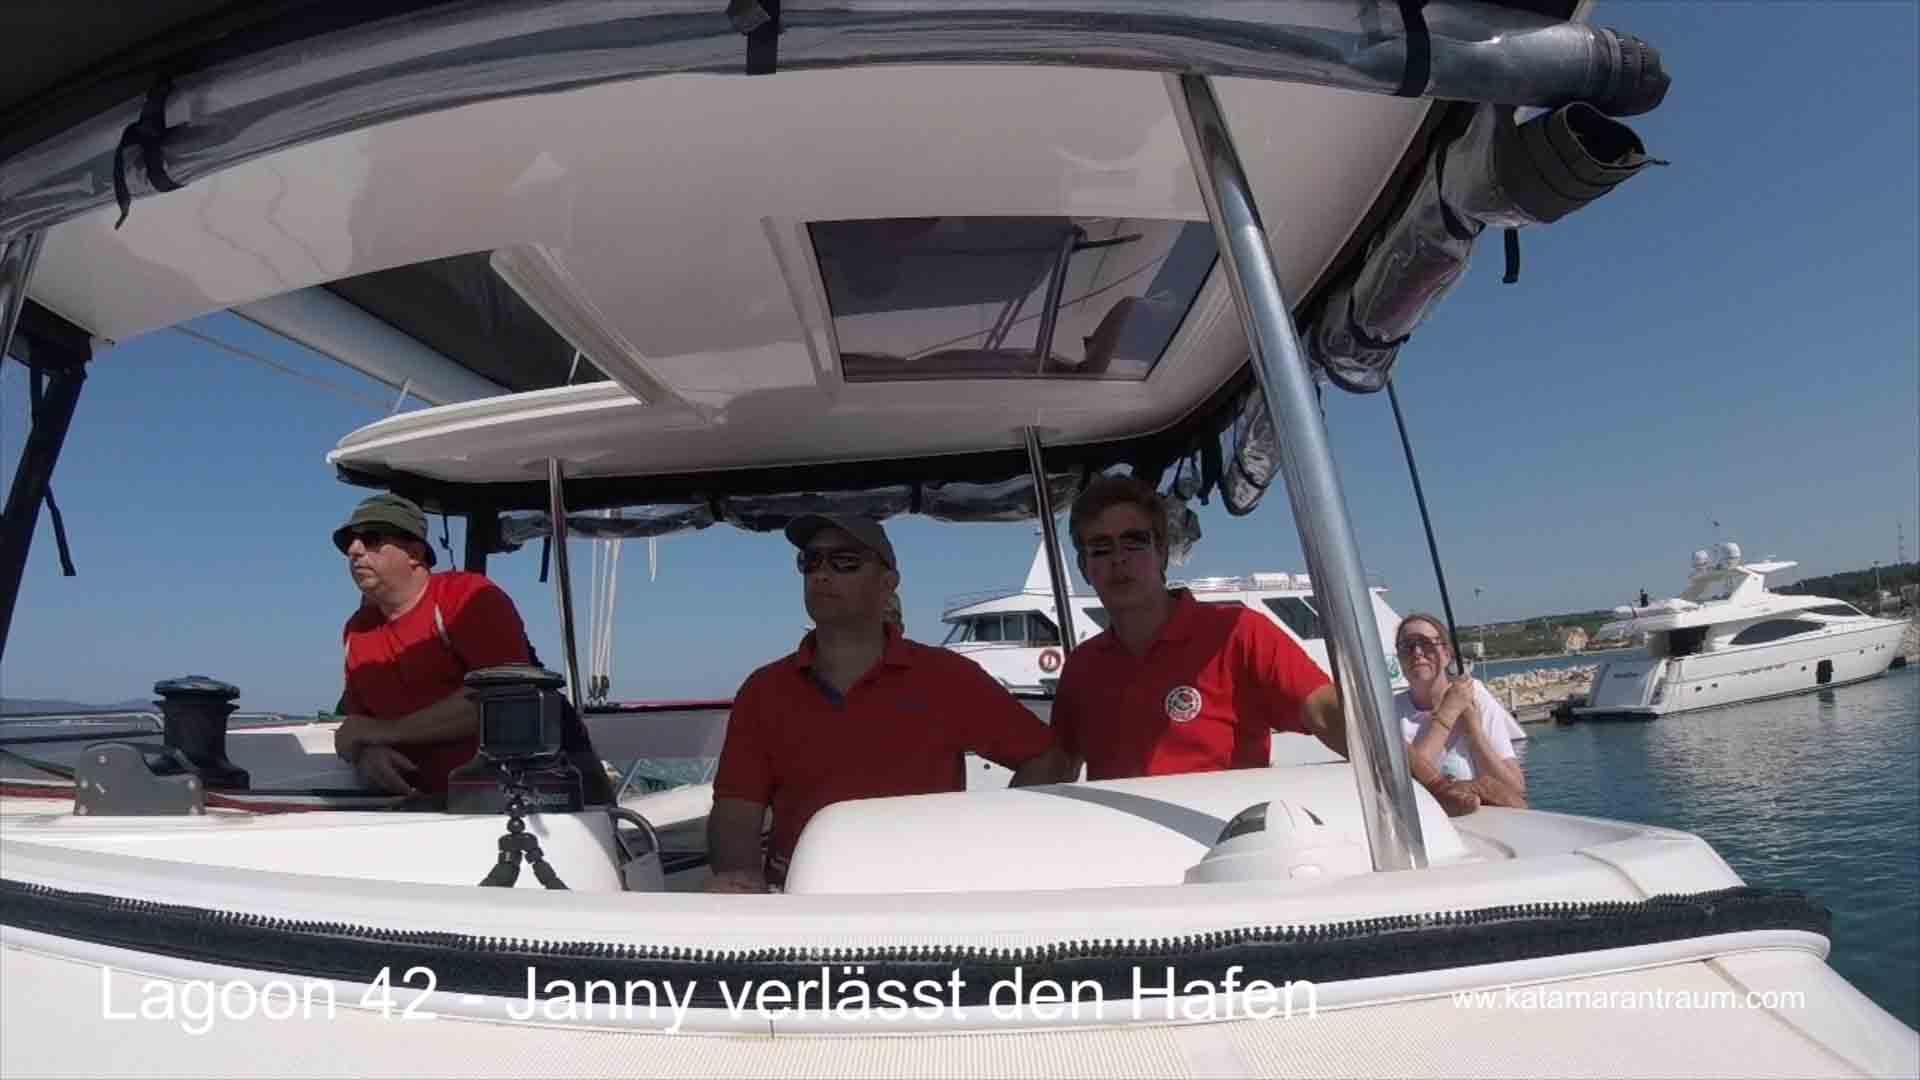 Ready for sailing practice catamaran Lagoon 42